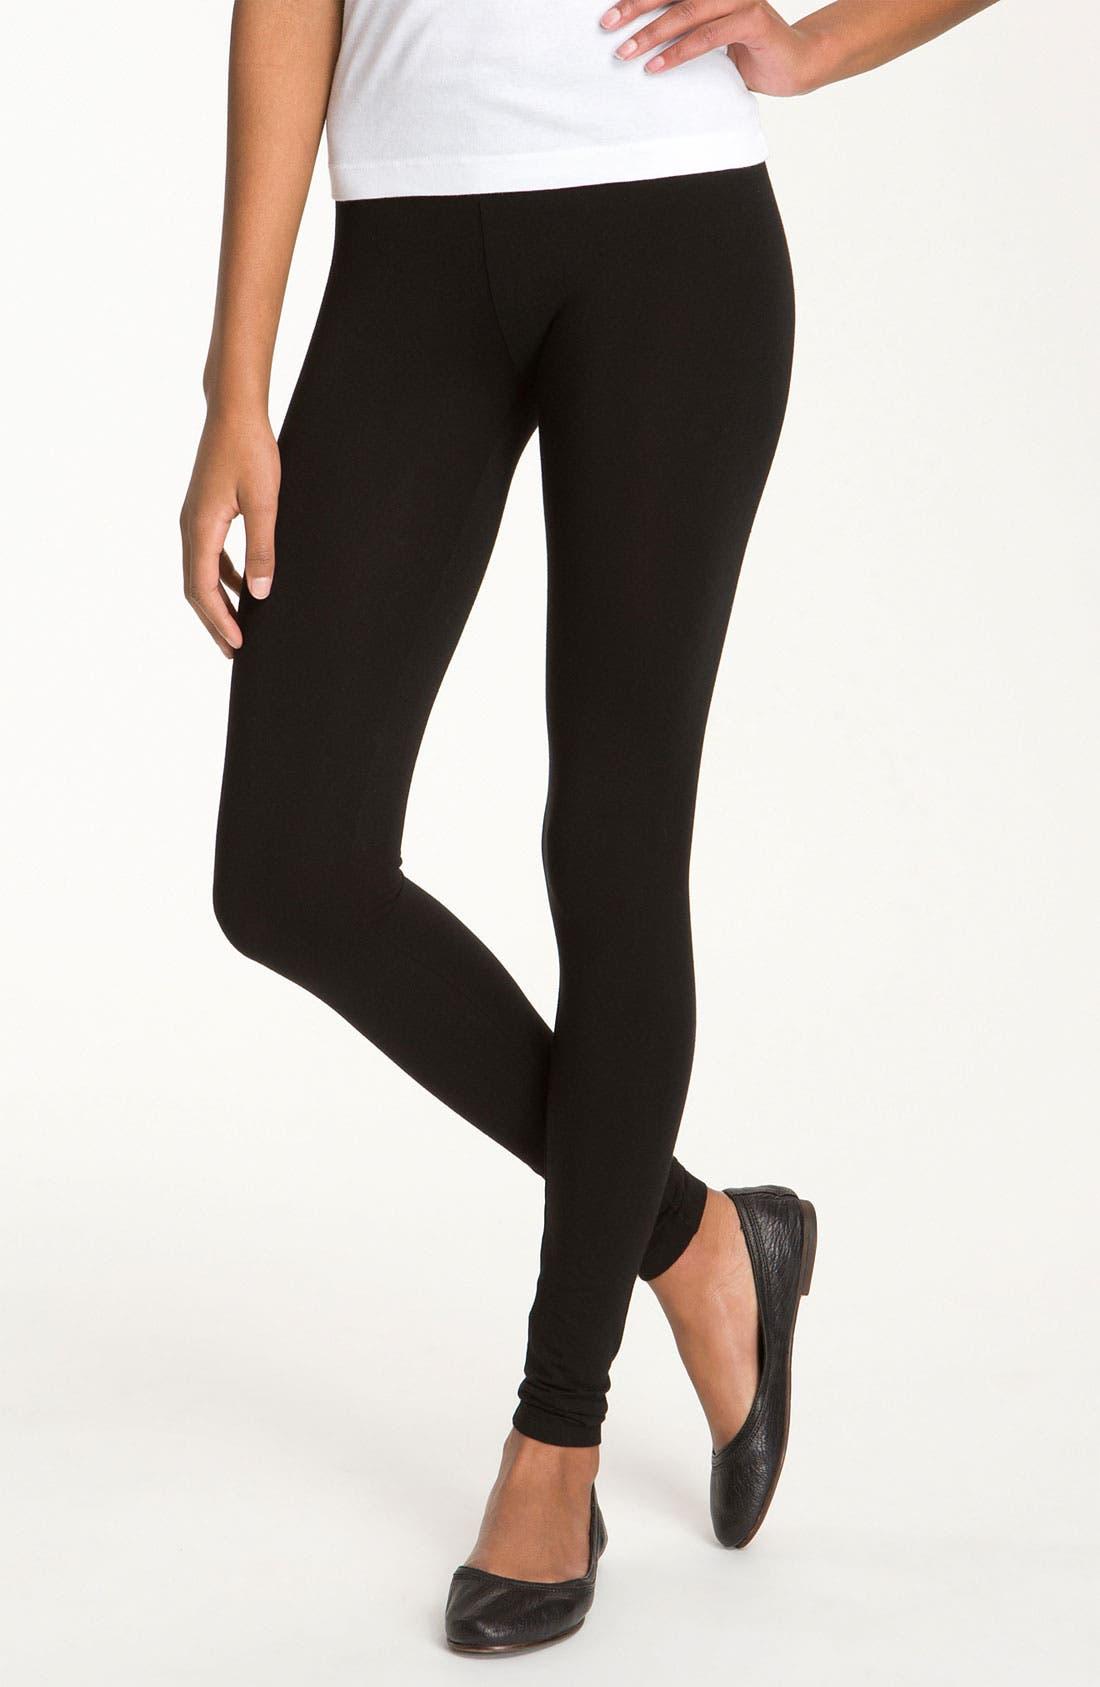 Splendid Stretch Cotton Leggings, Black